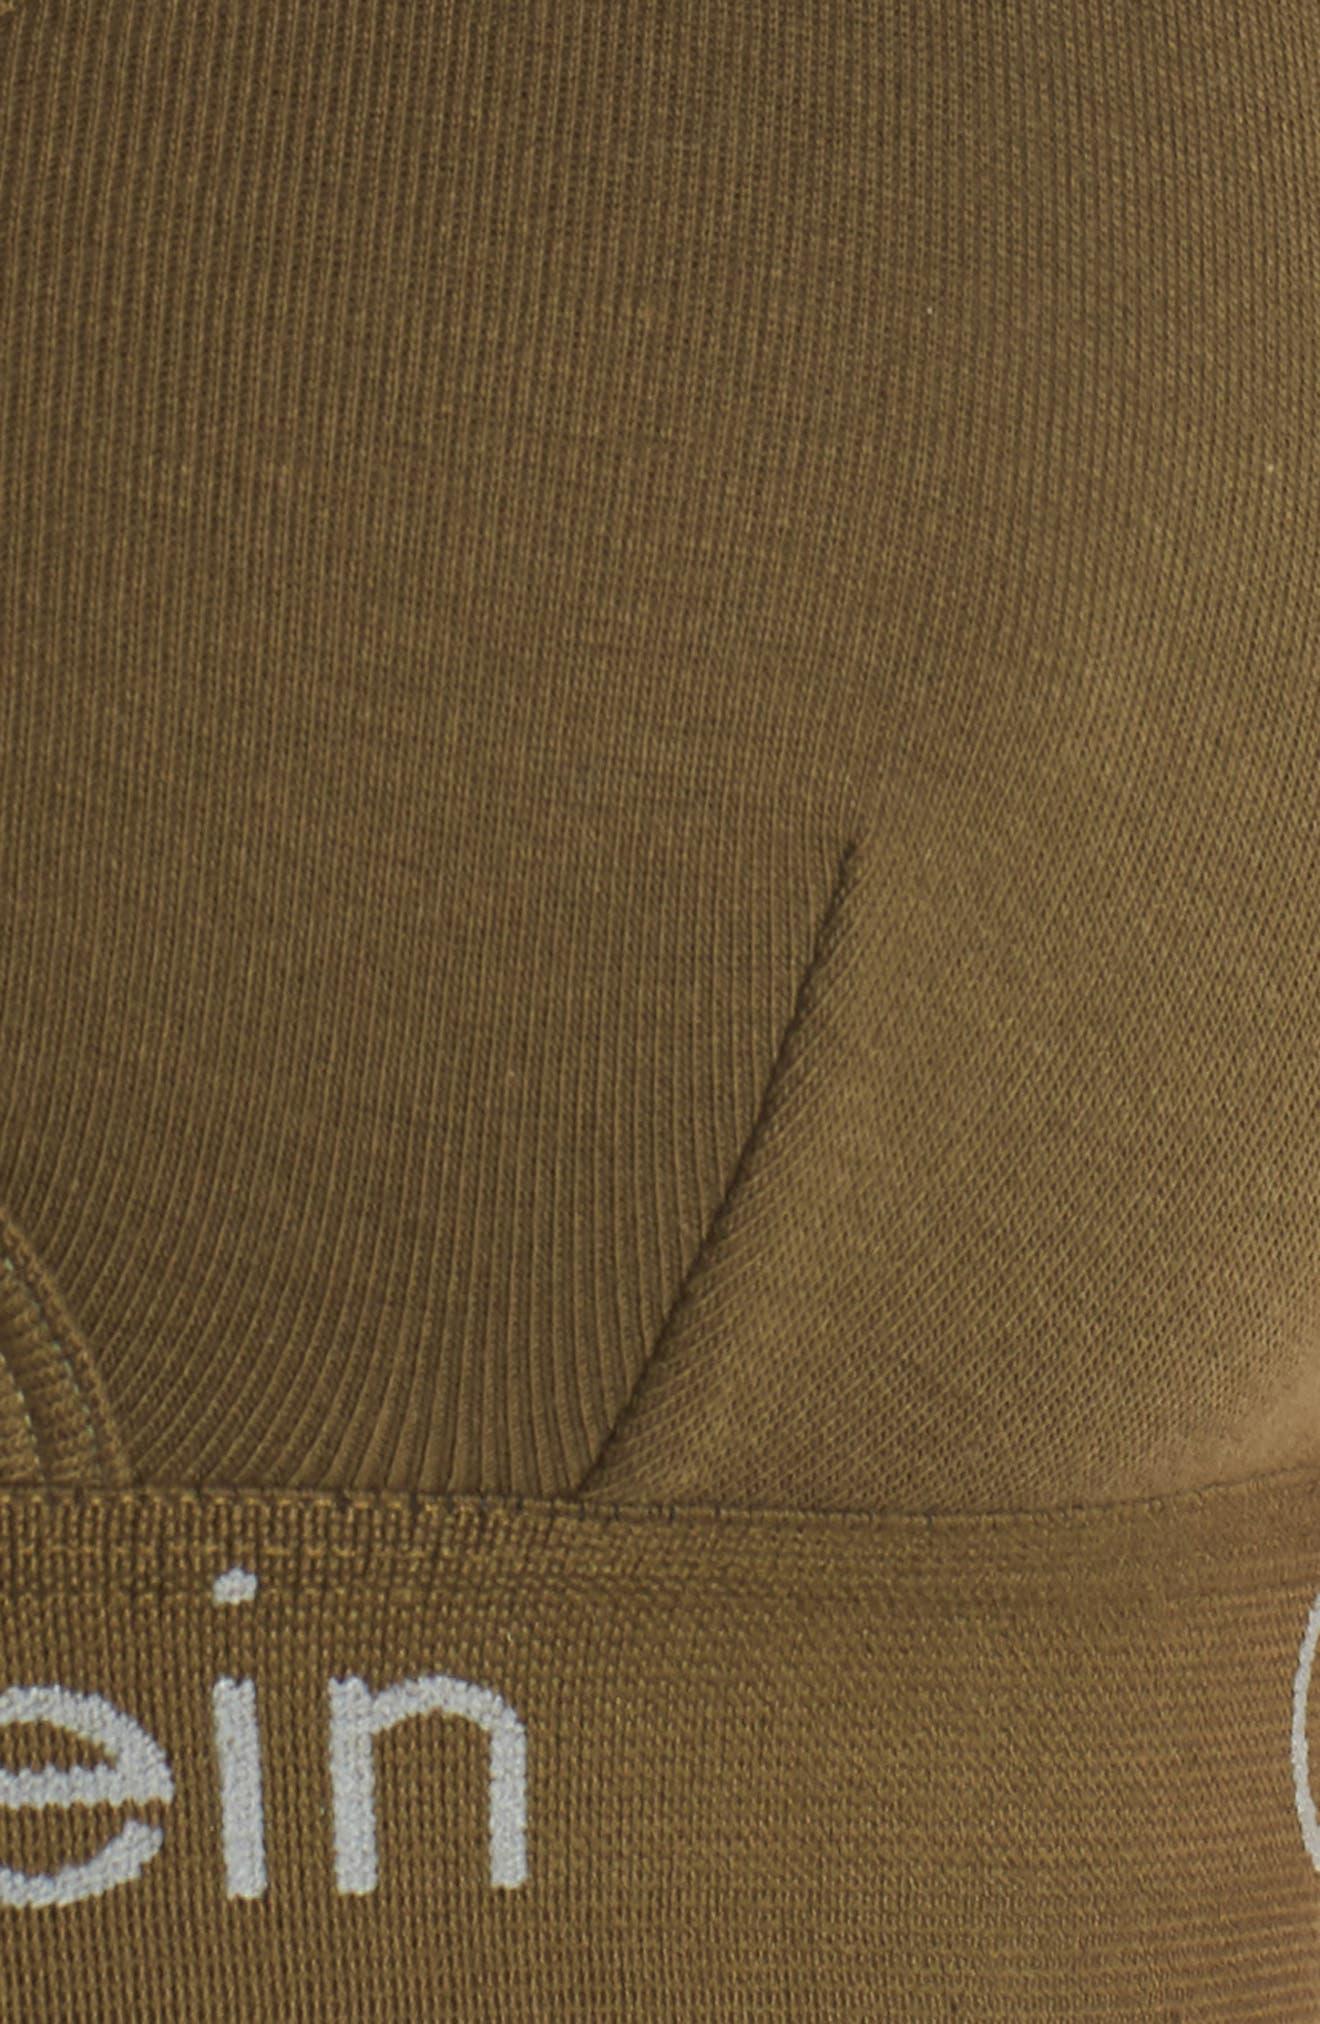 Body Cotton Bralette,                             Alternate thumbnail 8, color,                             Rifle Green